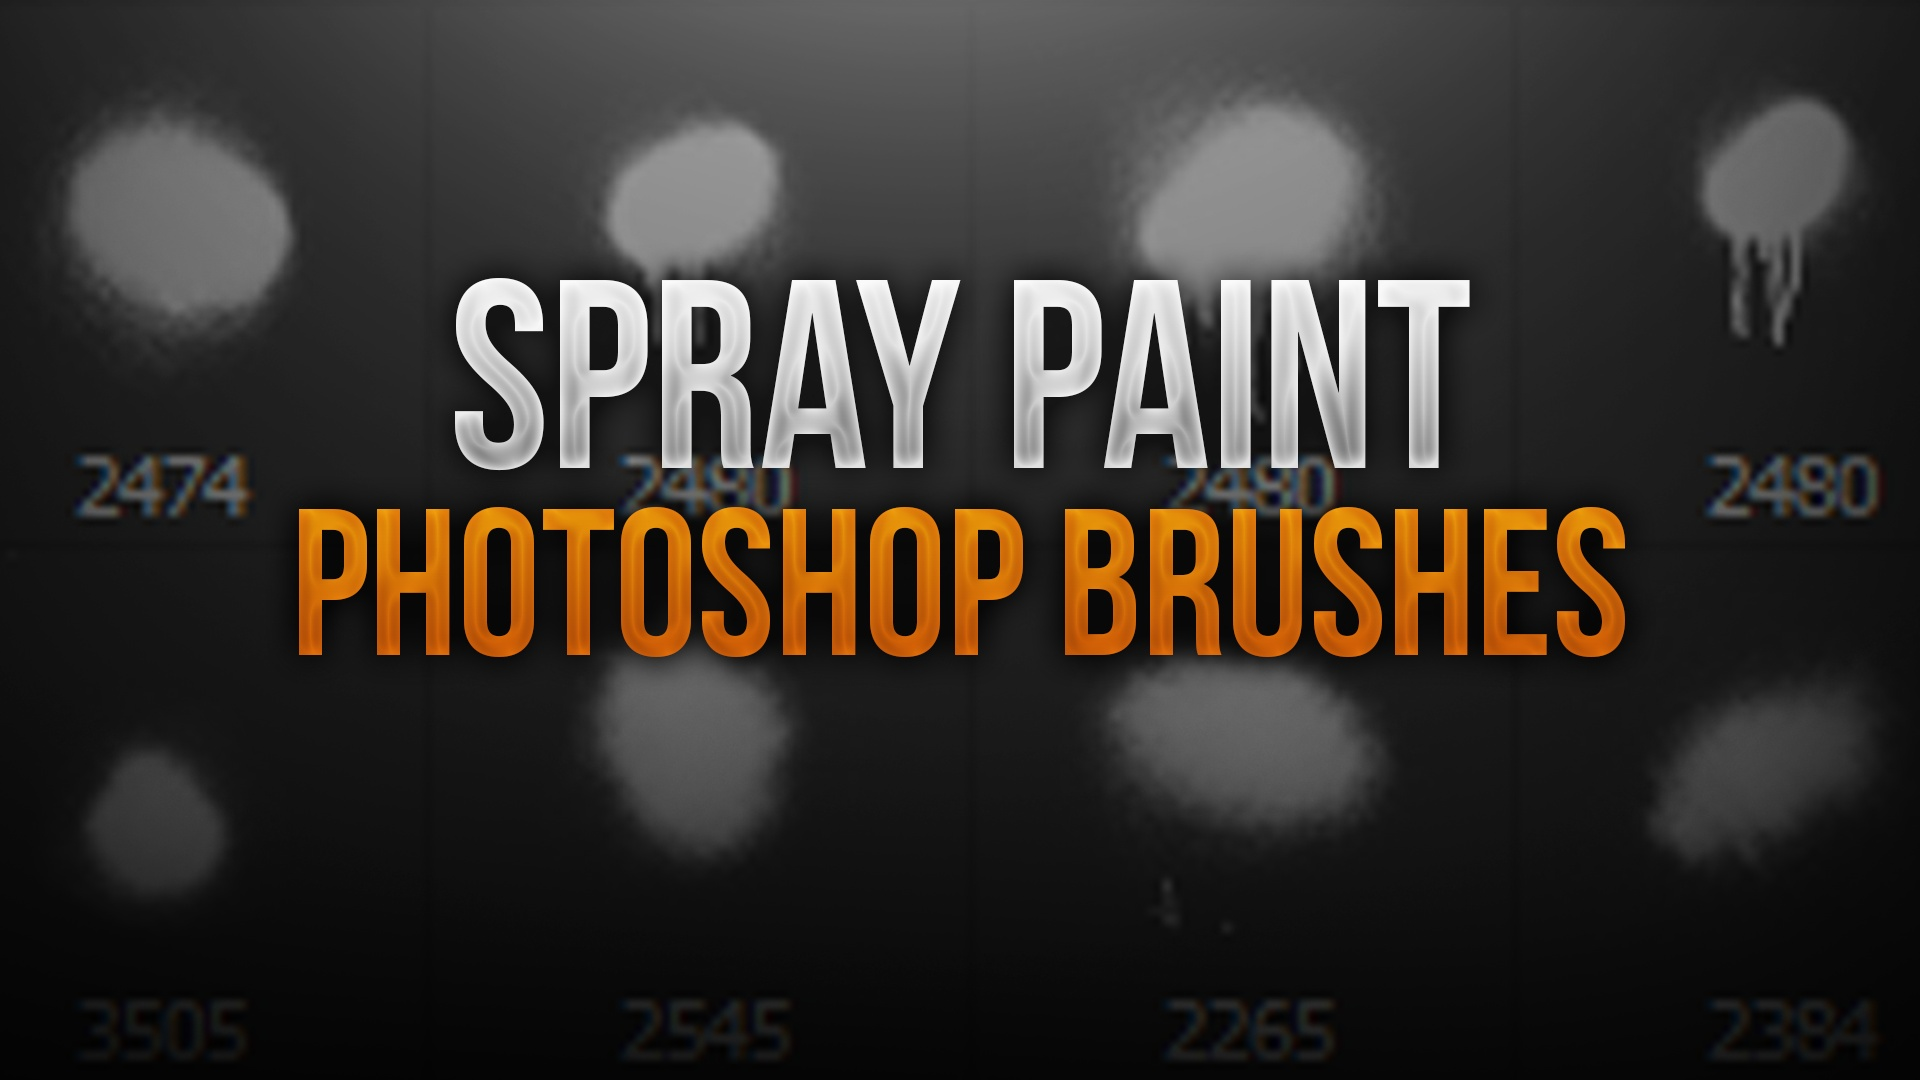 Spray Paint Photoshop Brush Pack